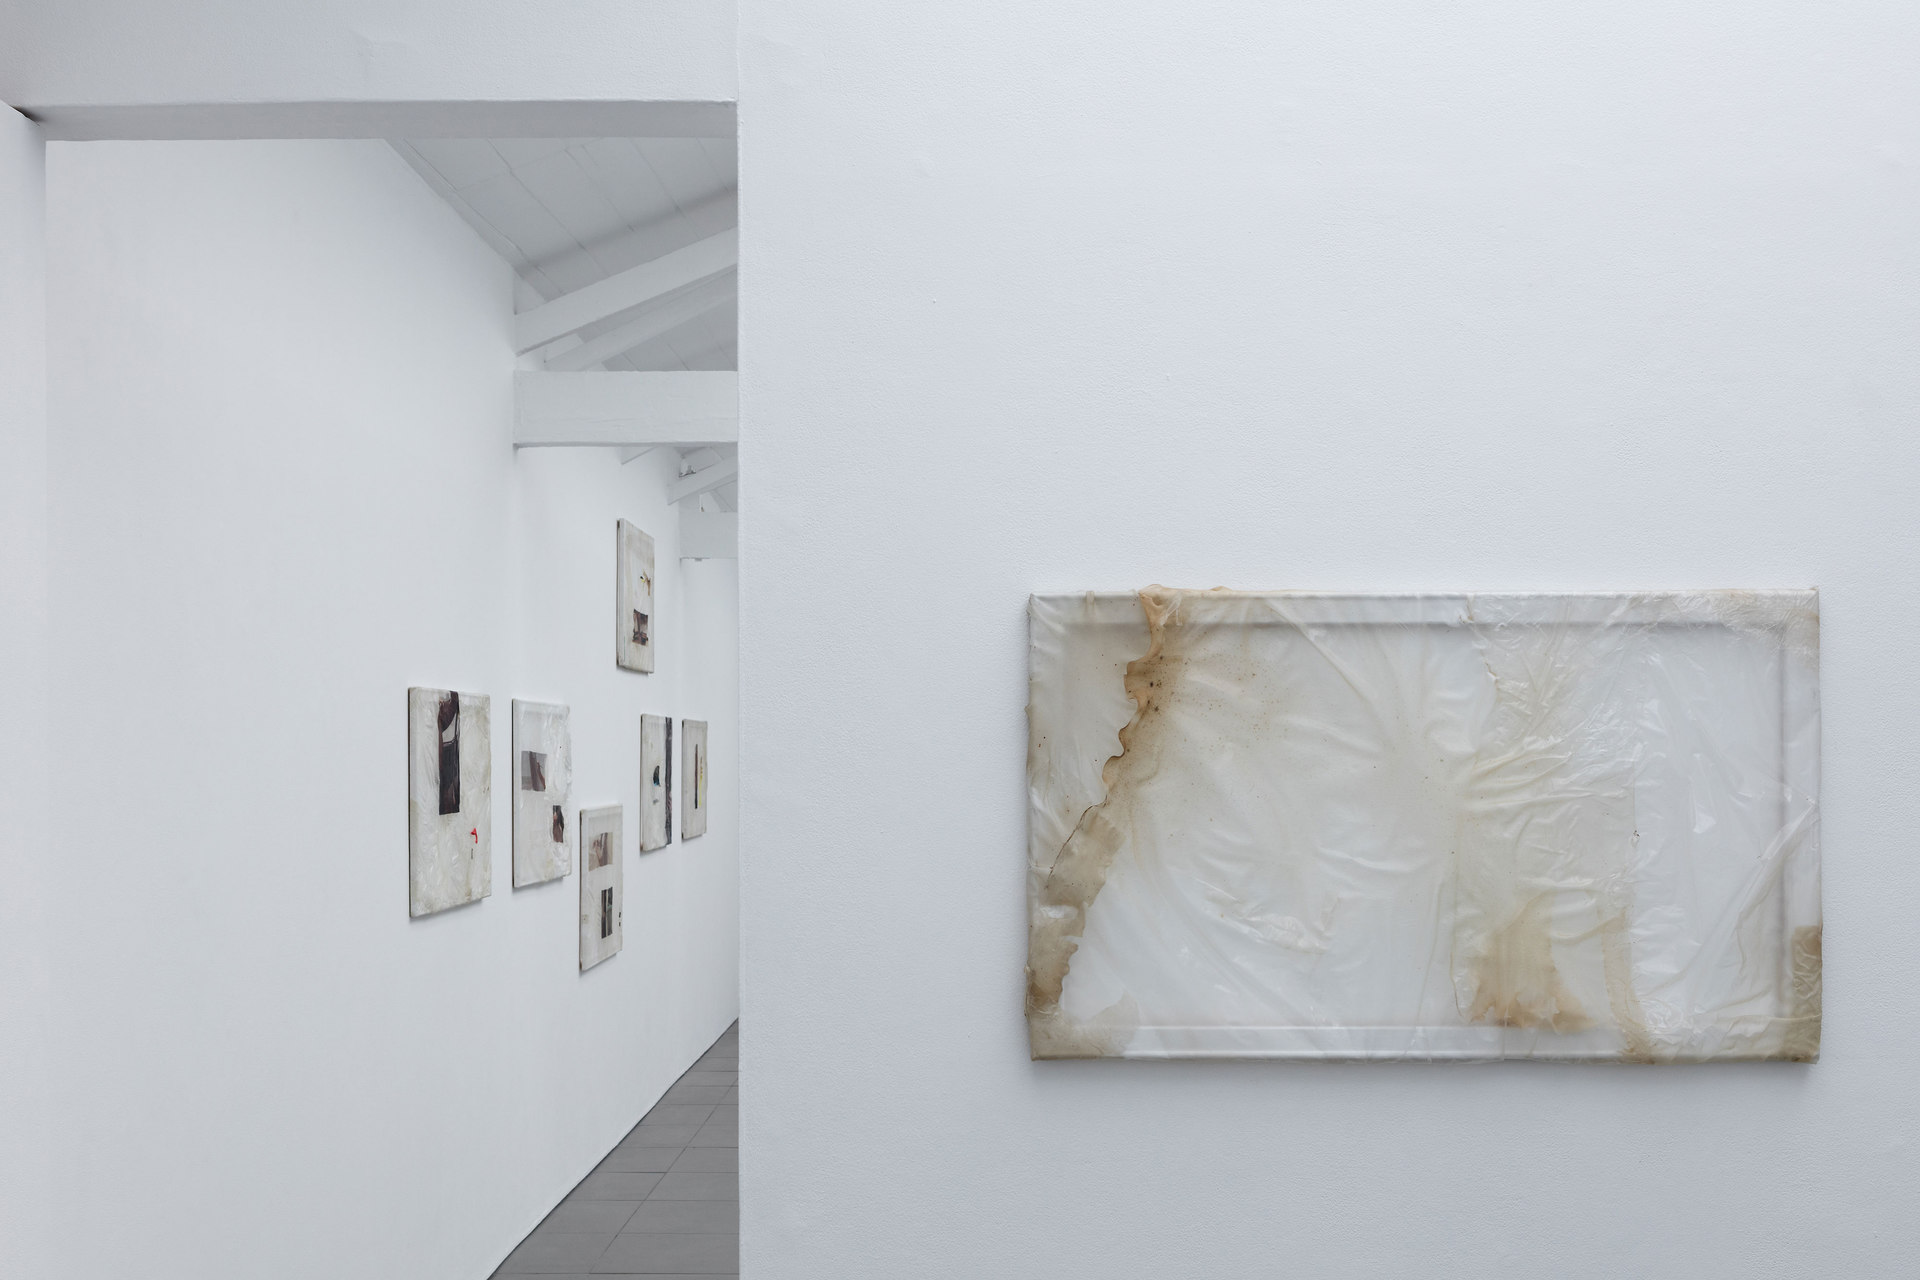 Aude Pariset, GREENHOUSES, 'Ménage Garbage Patch 2', Bioplastic, mold, wood, paint, 55 x 110cm, 2016, Cell Project Space